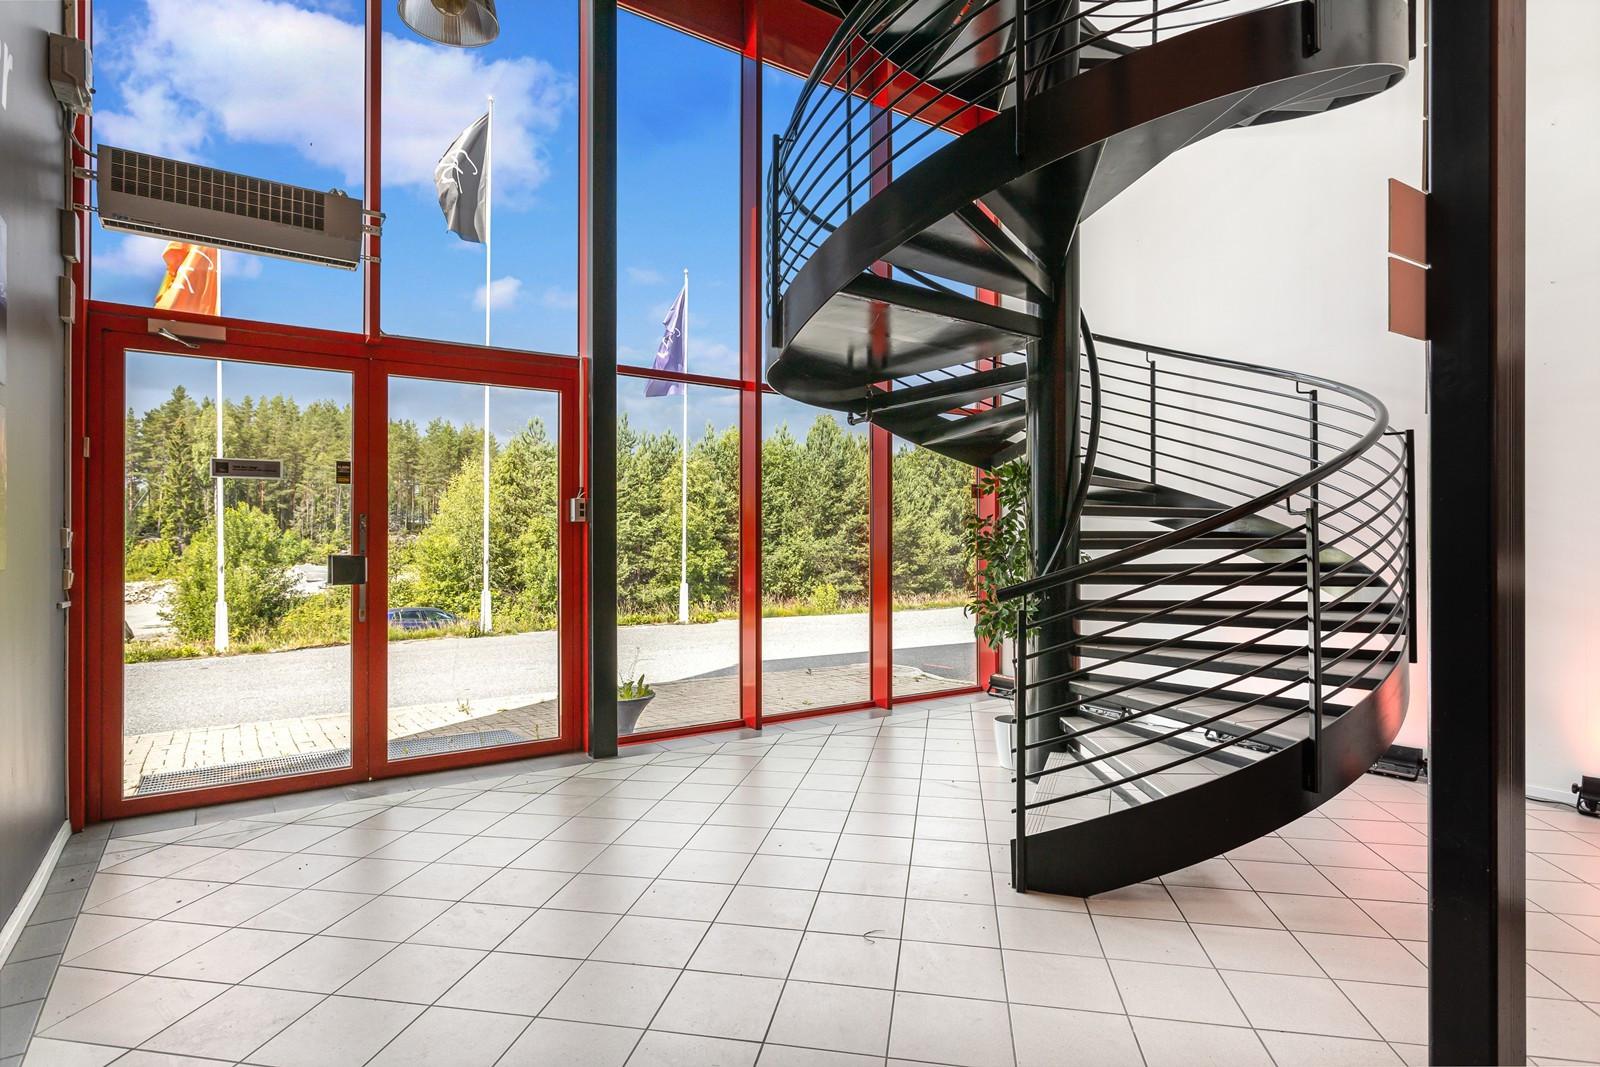 Hovedinngang kontor - trapp til 2. etasje (kontoretasjen)